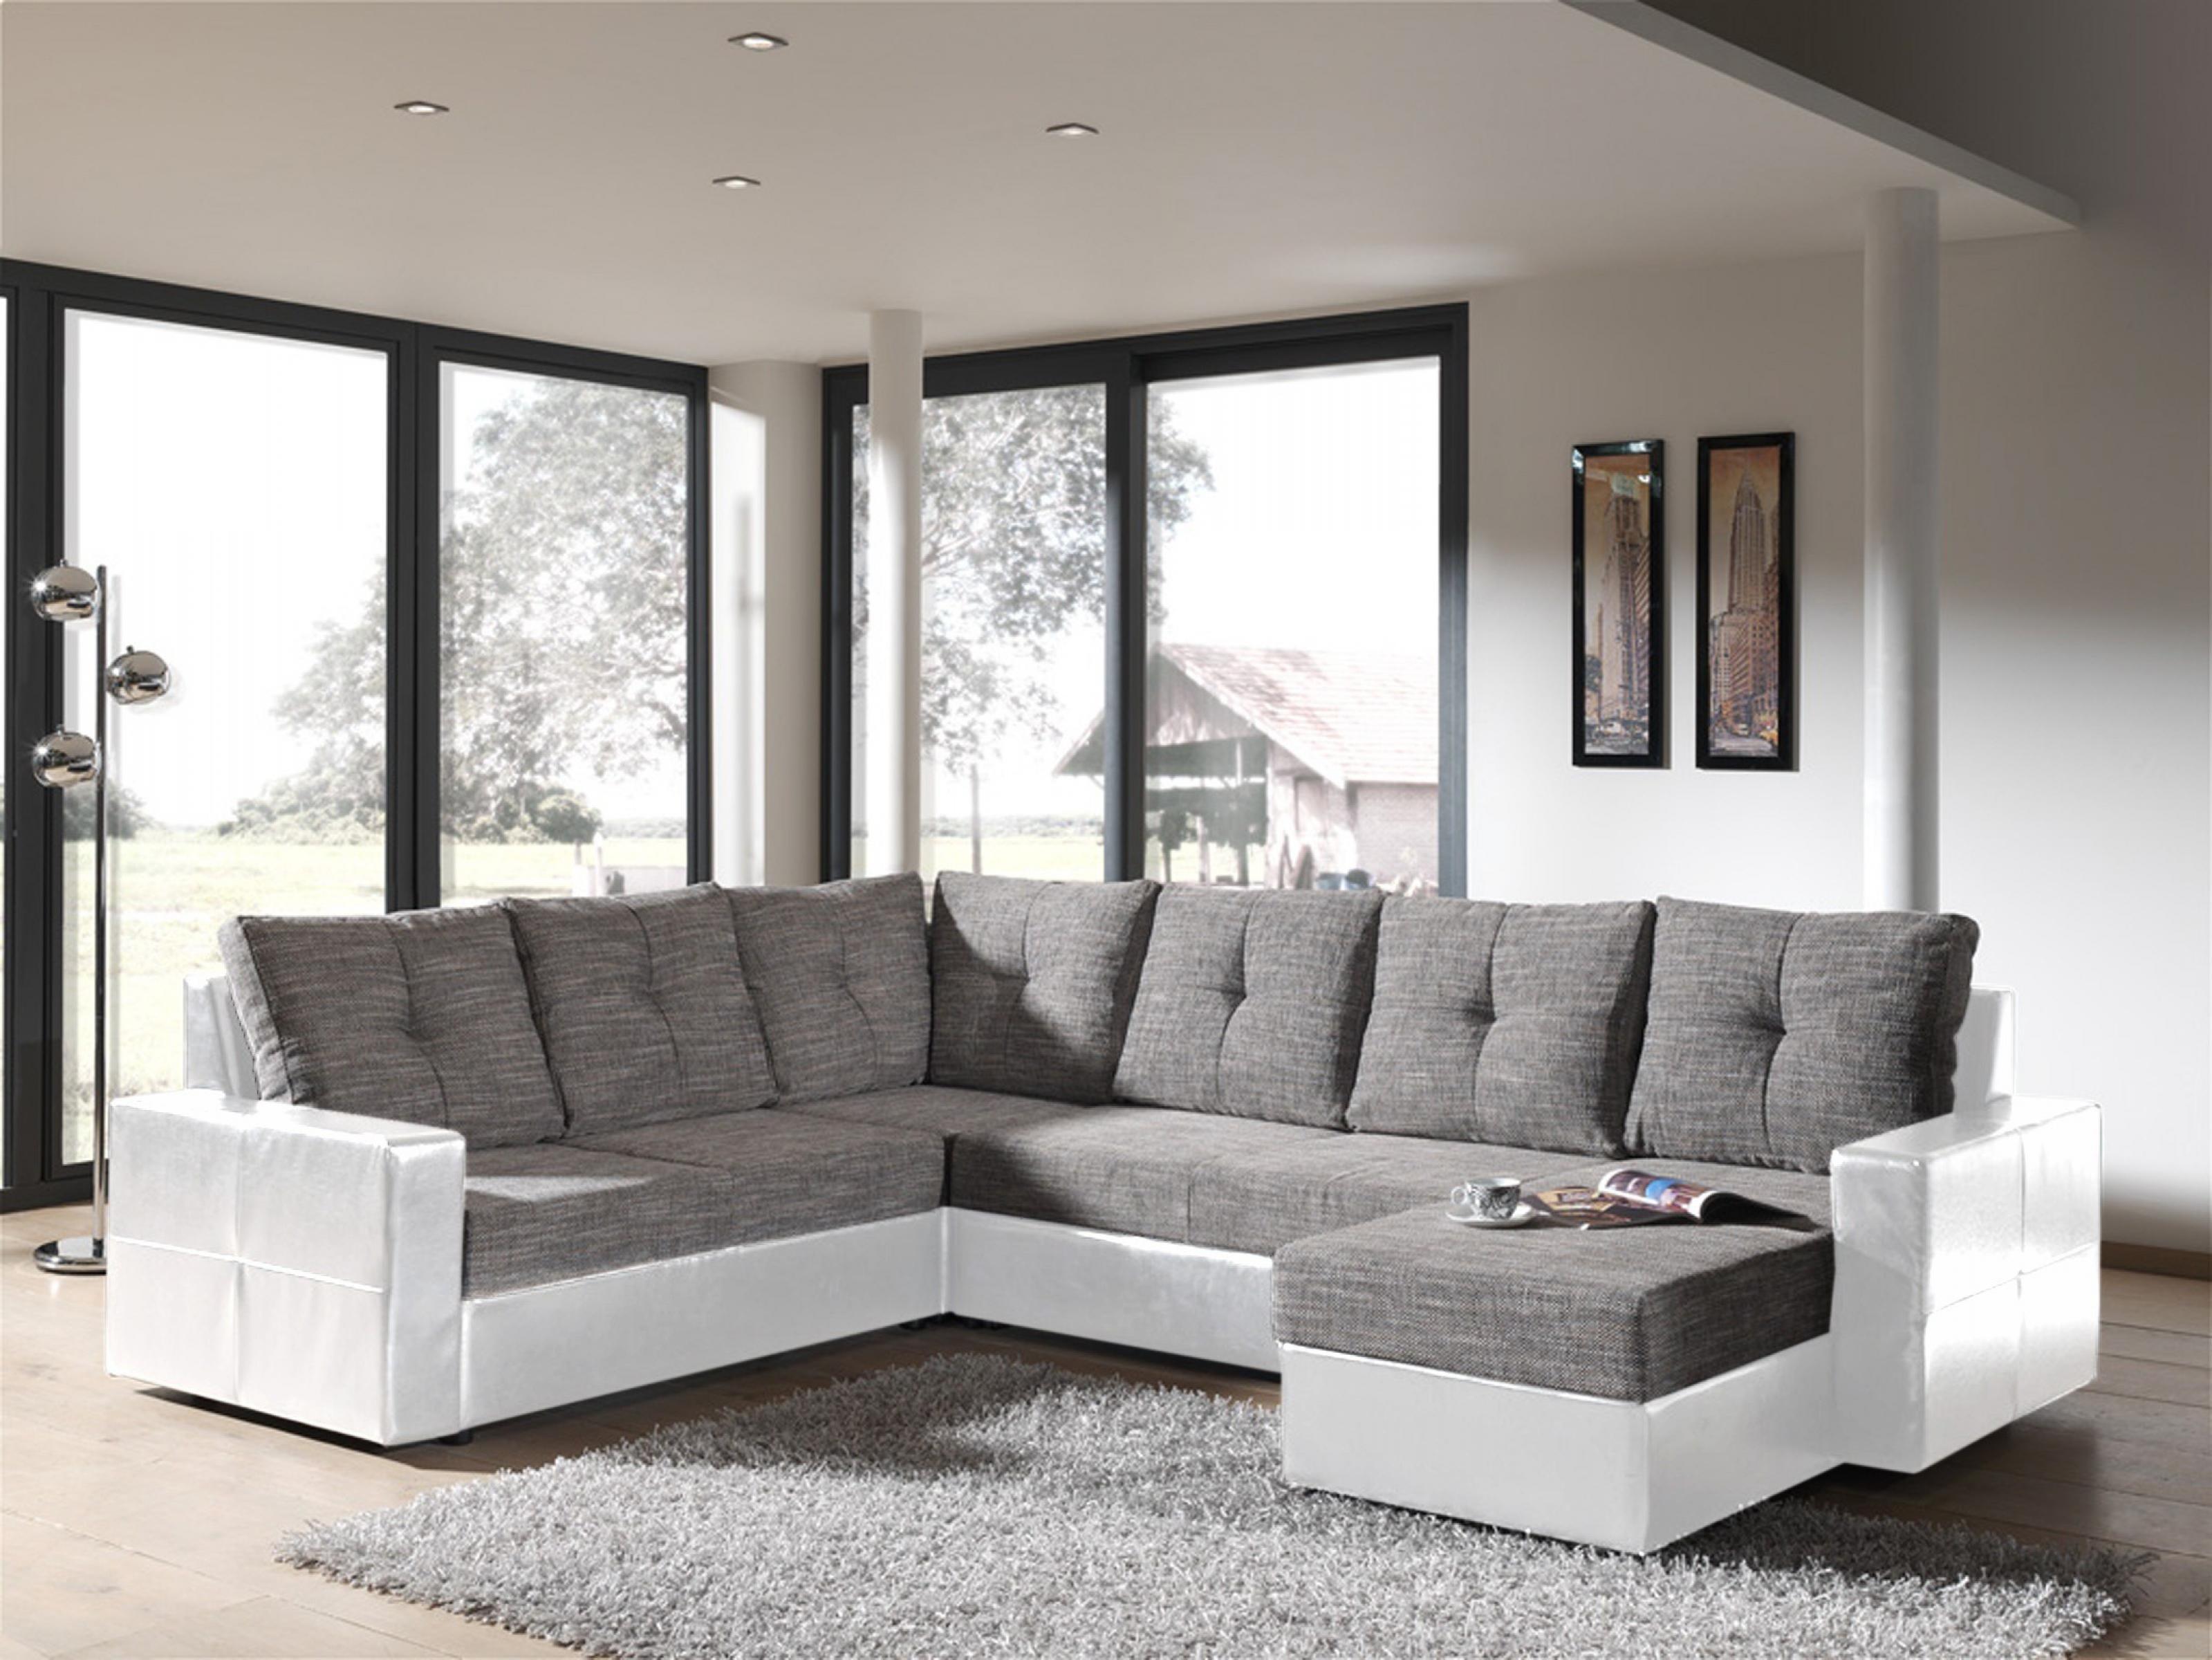 Canape D Angle Ikea Convertible Nouveau Stock Ikea Salon En Cuir